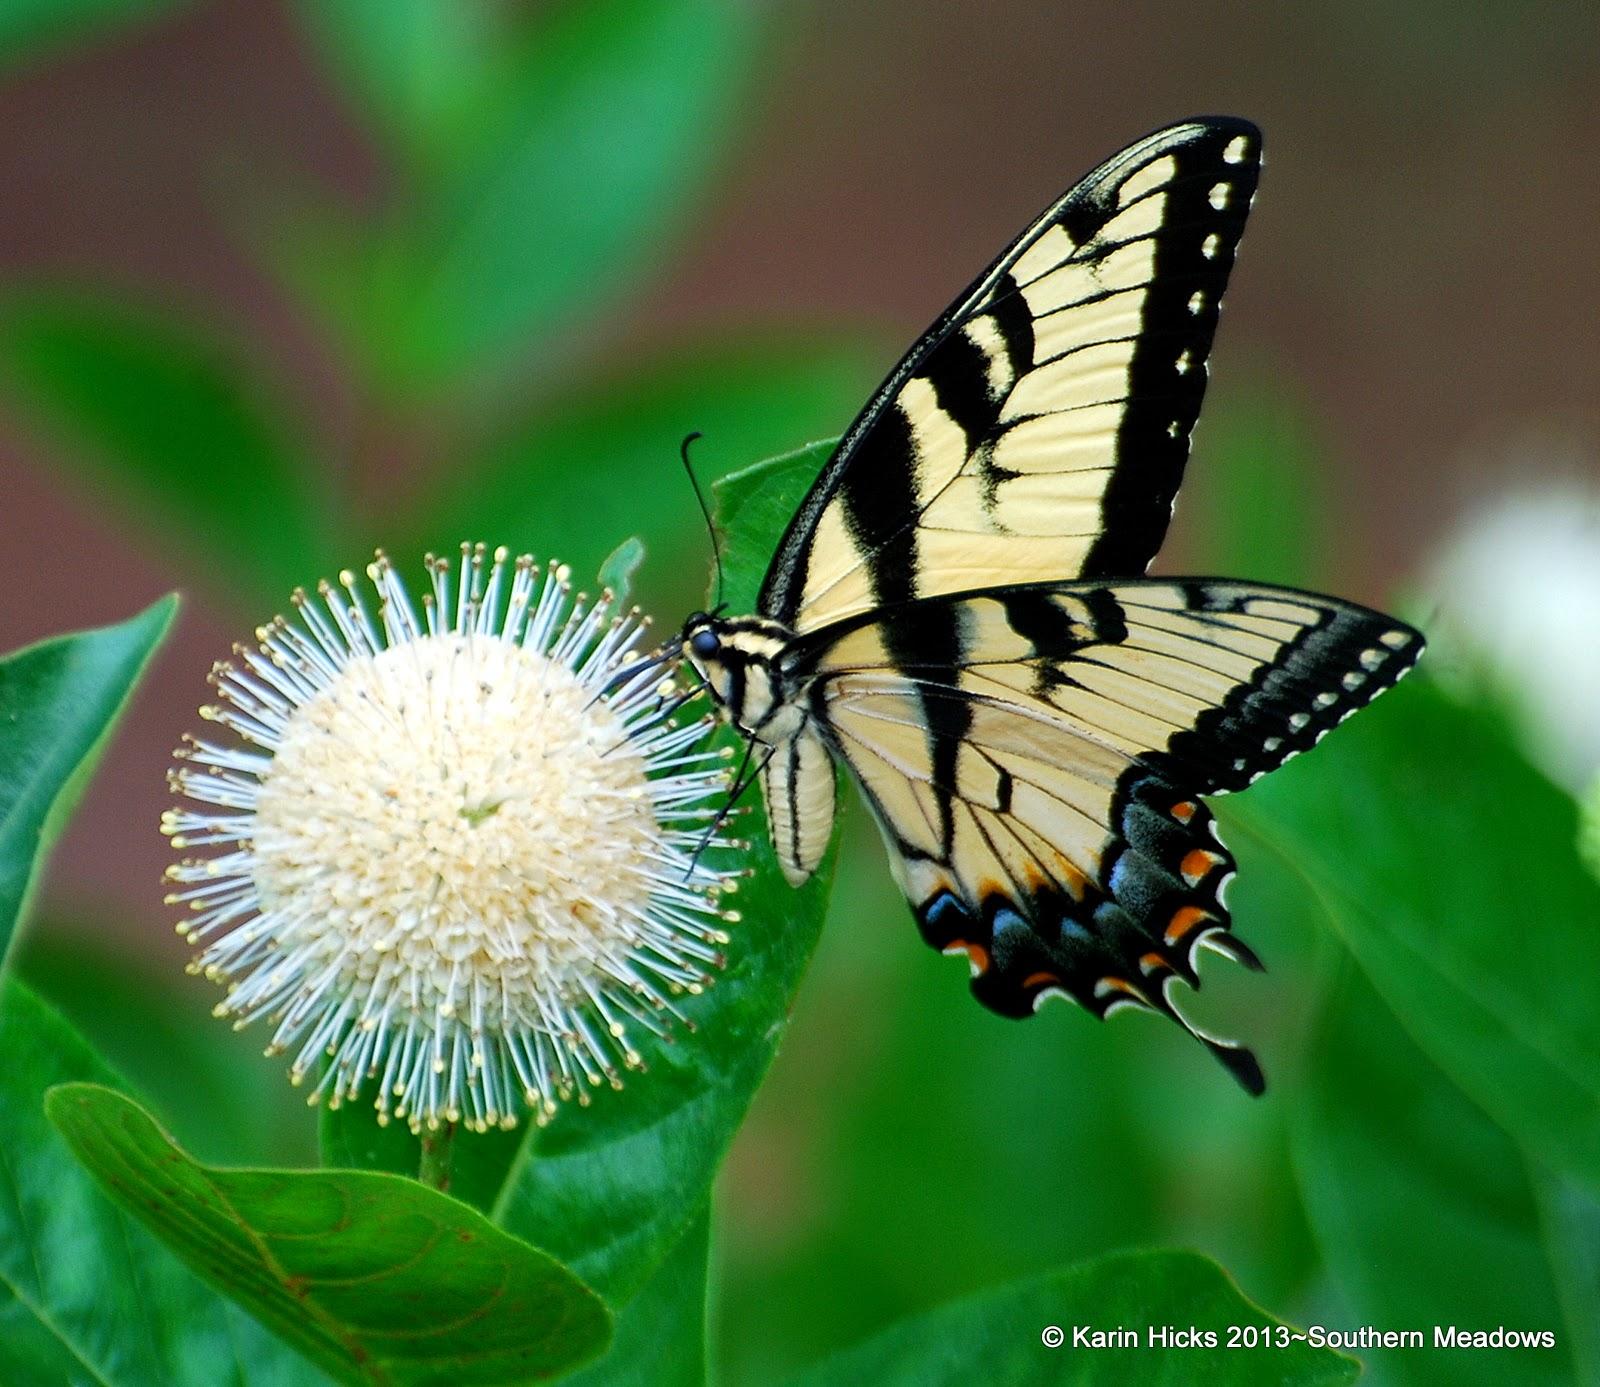 Eastern Tiger Swallowtail butterfly on button bush bloom